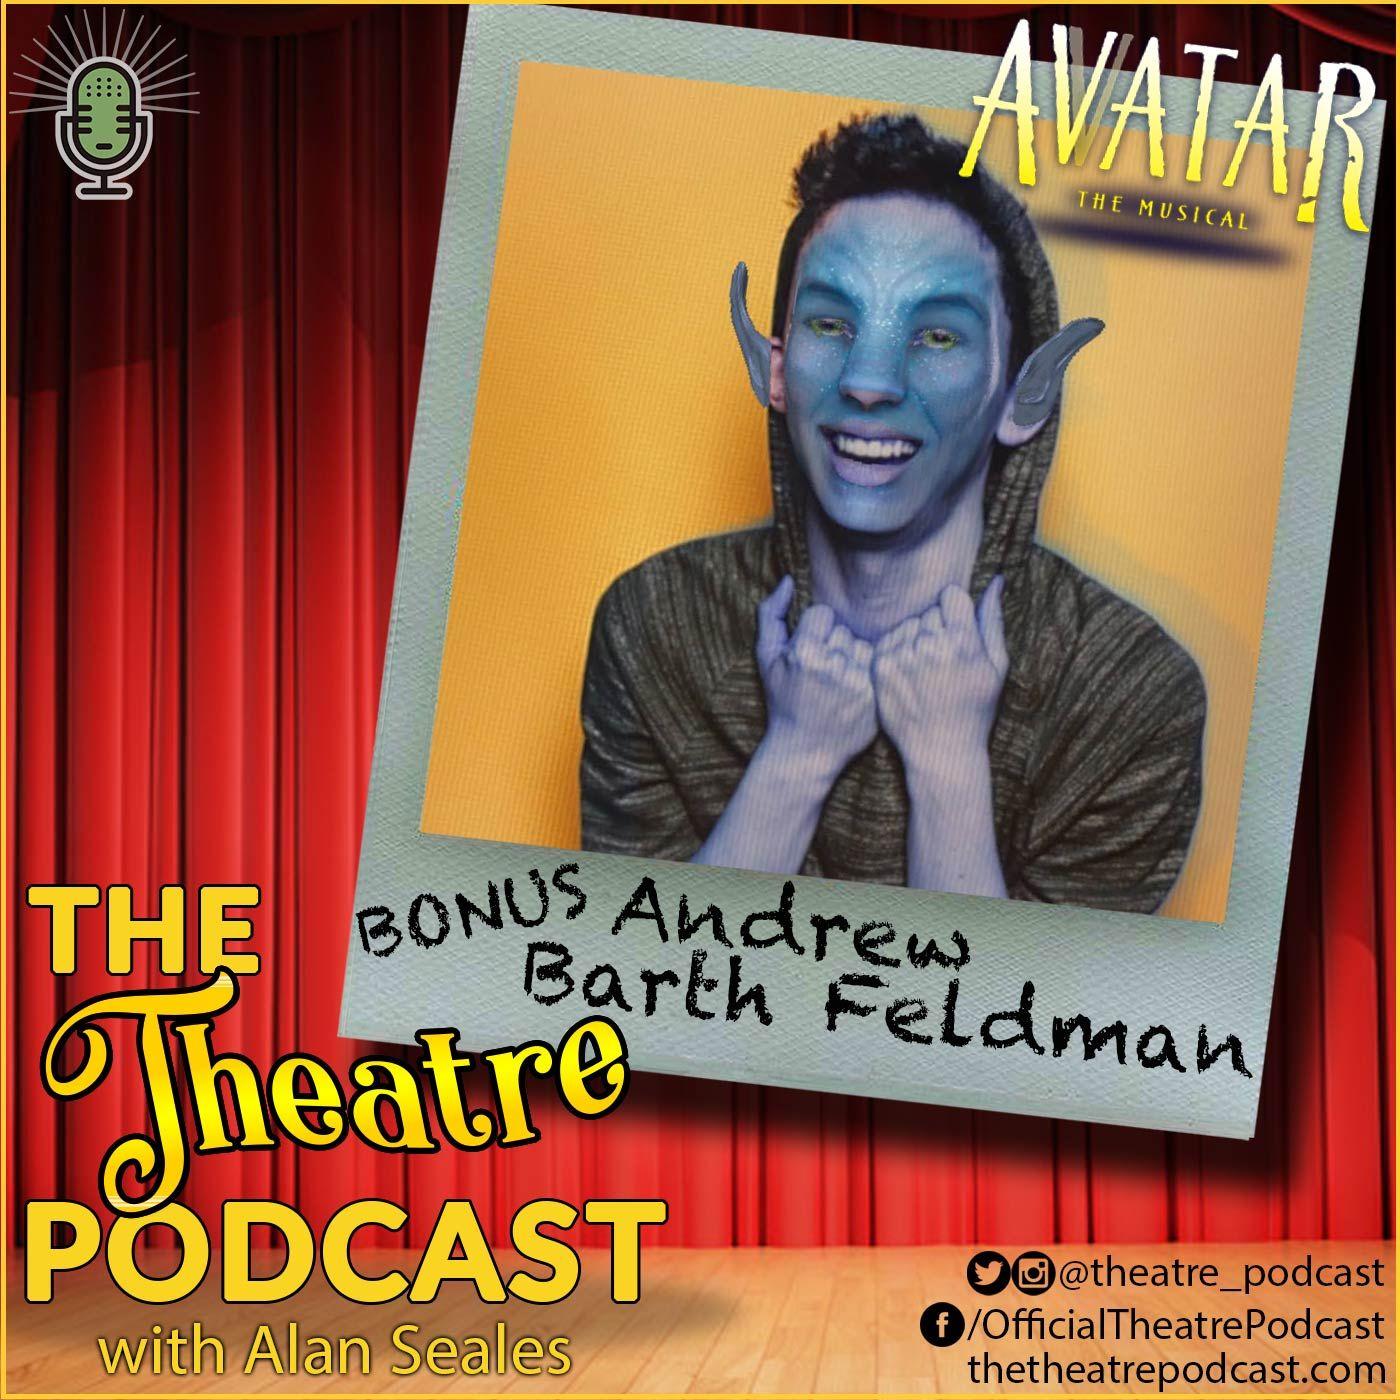 BONUS - Andrew Barth Feldman on The Theater Podcast with Alan Seales